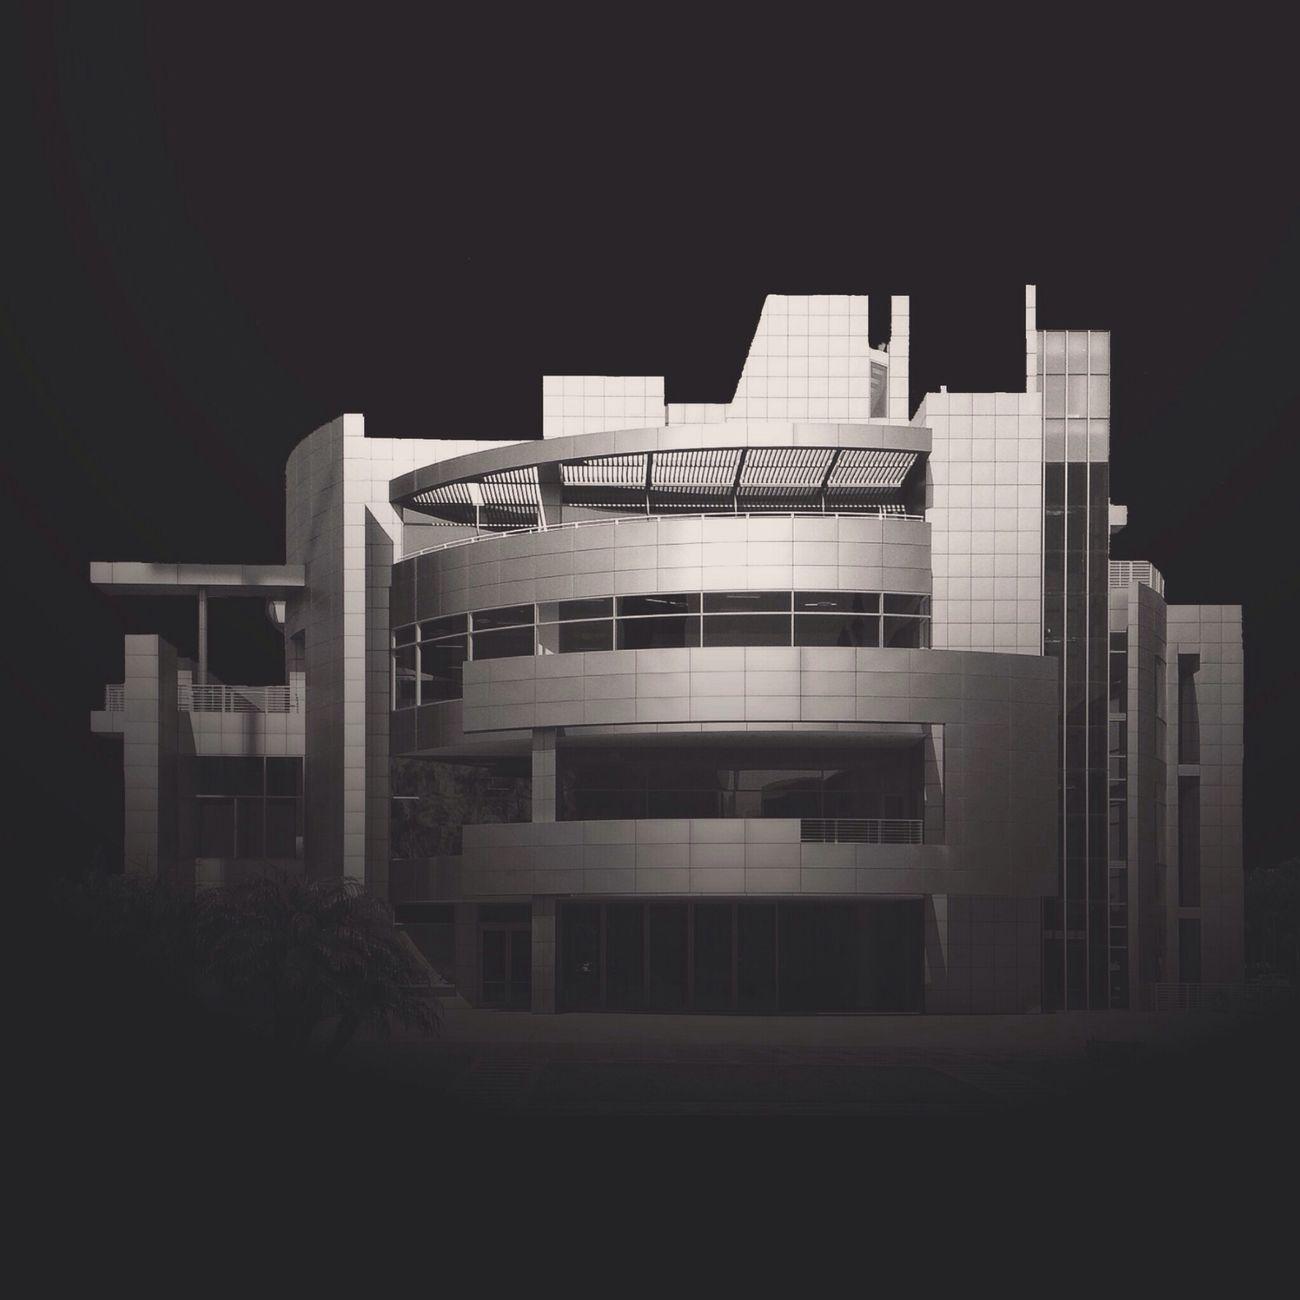 Blackandwhite Architecture Monochrome Architectural Detail RichardMeier